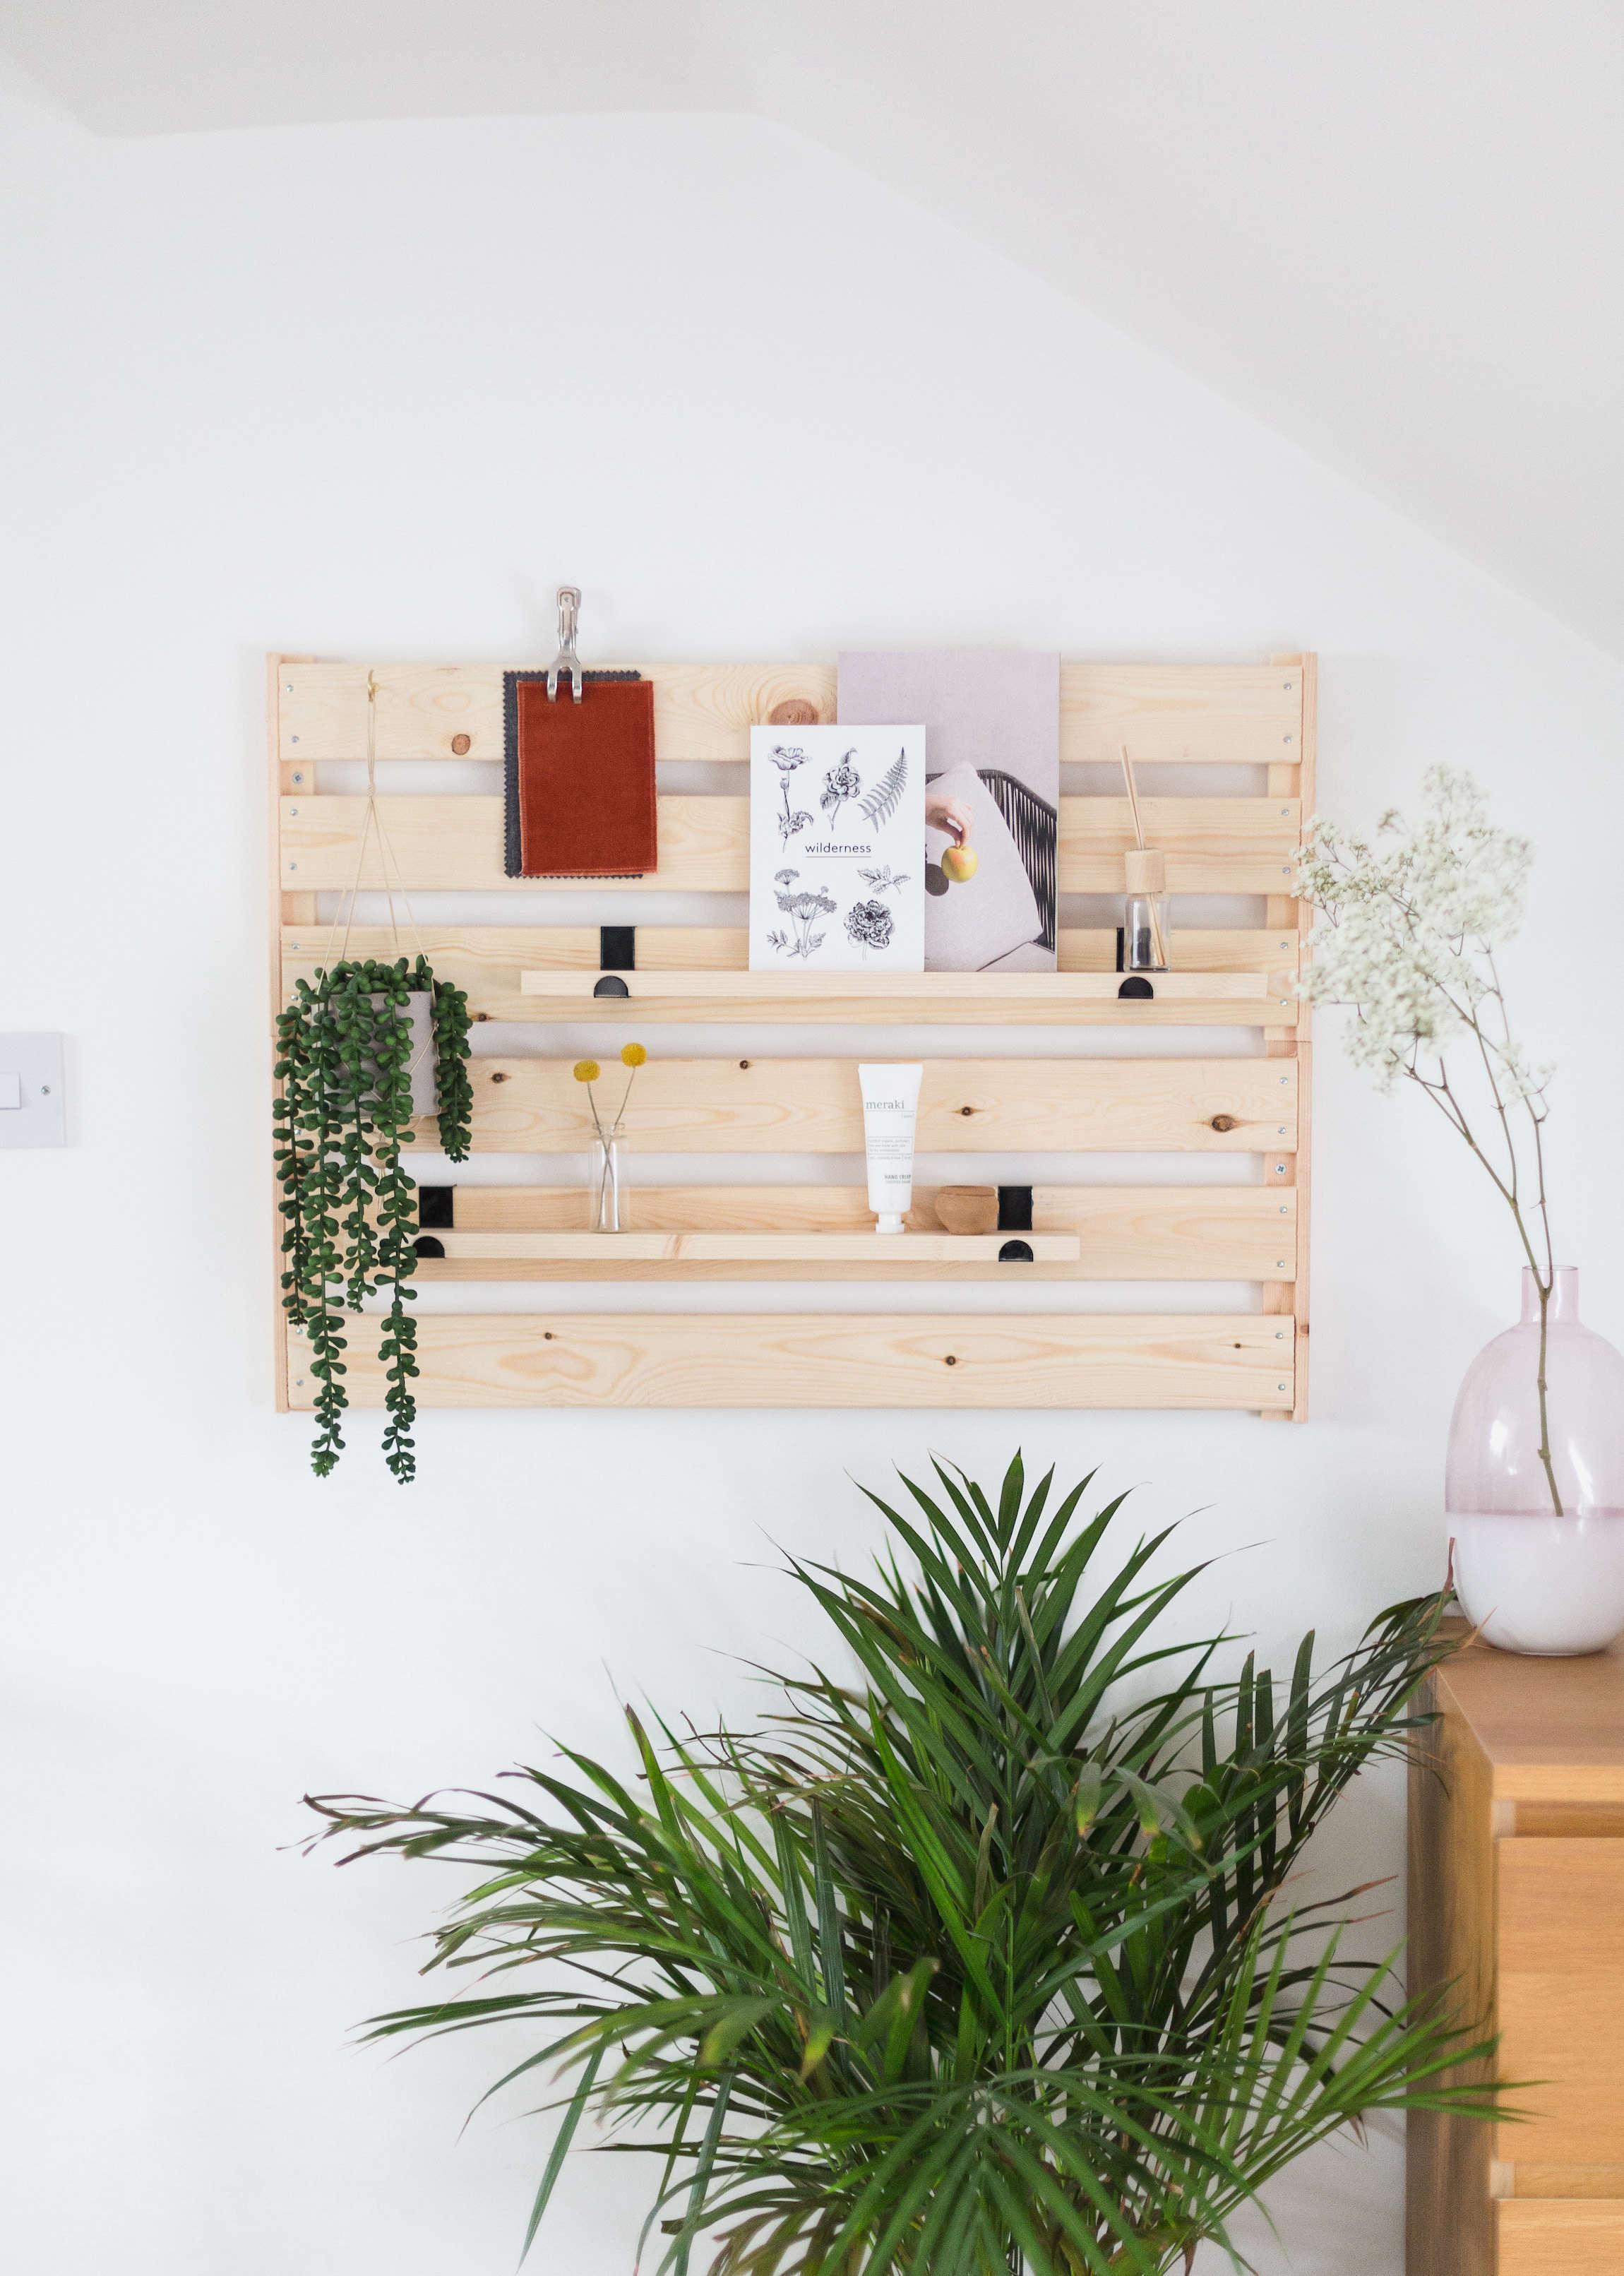 DIY Ikea Hack: A Genius, No-Skills-Required Storage Project